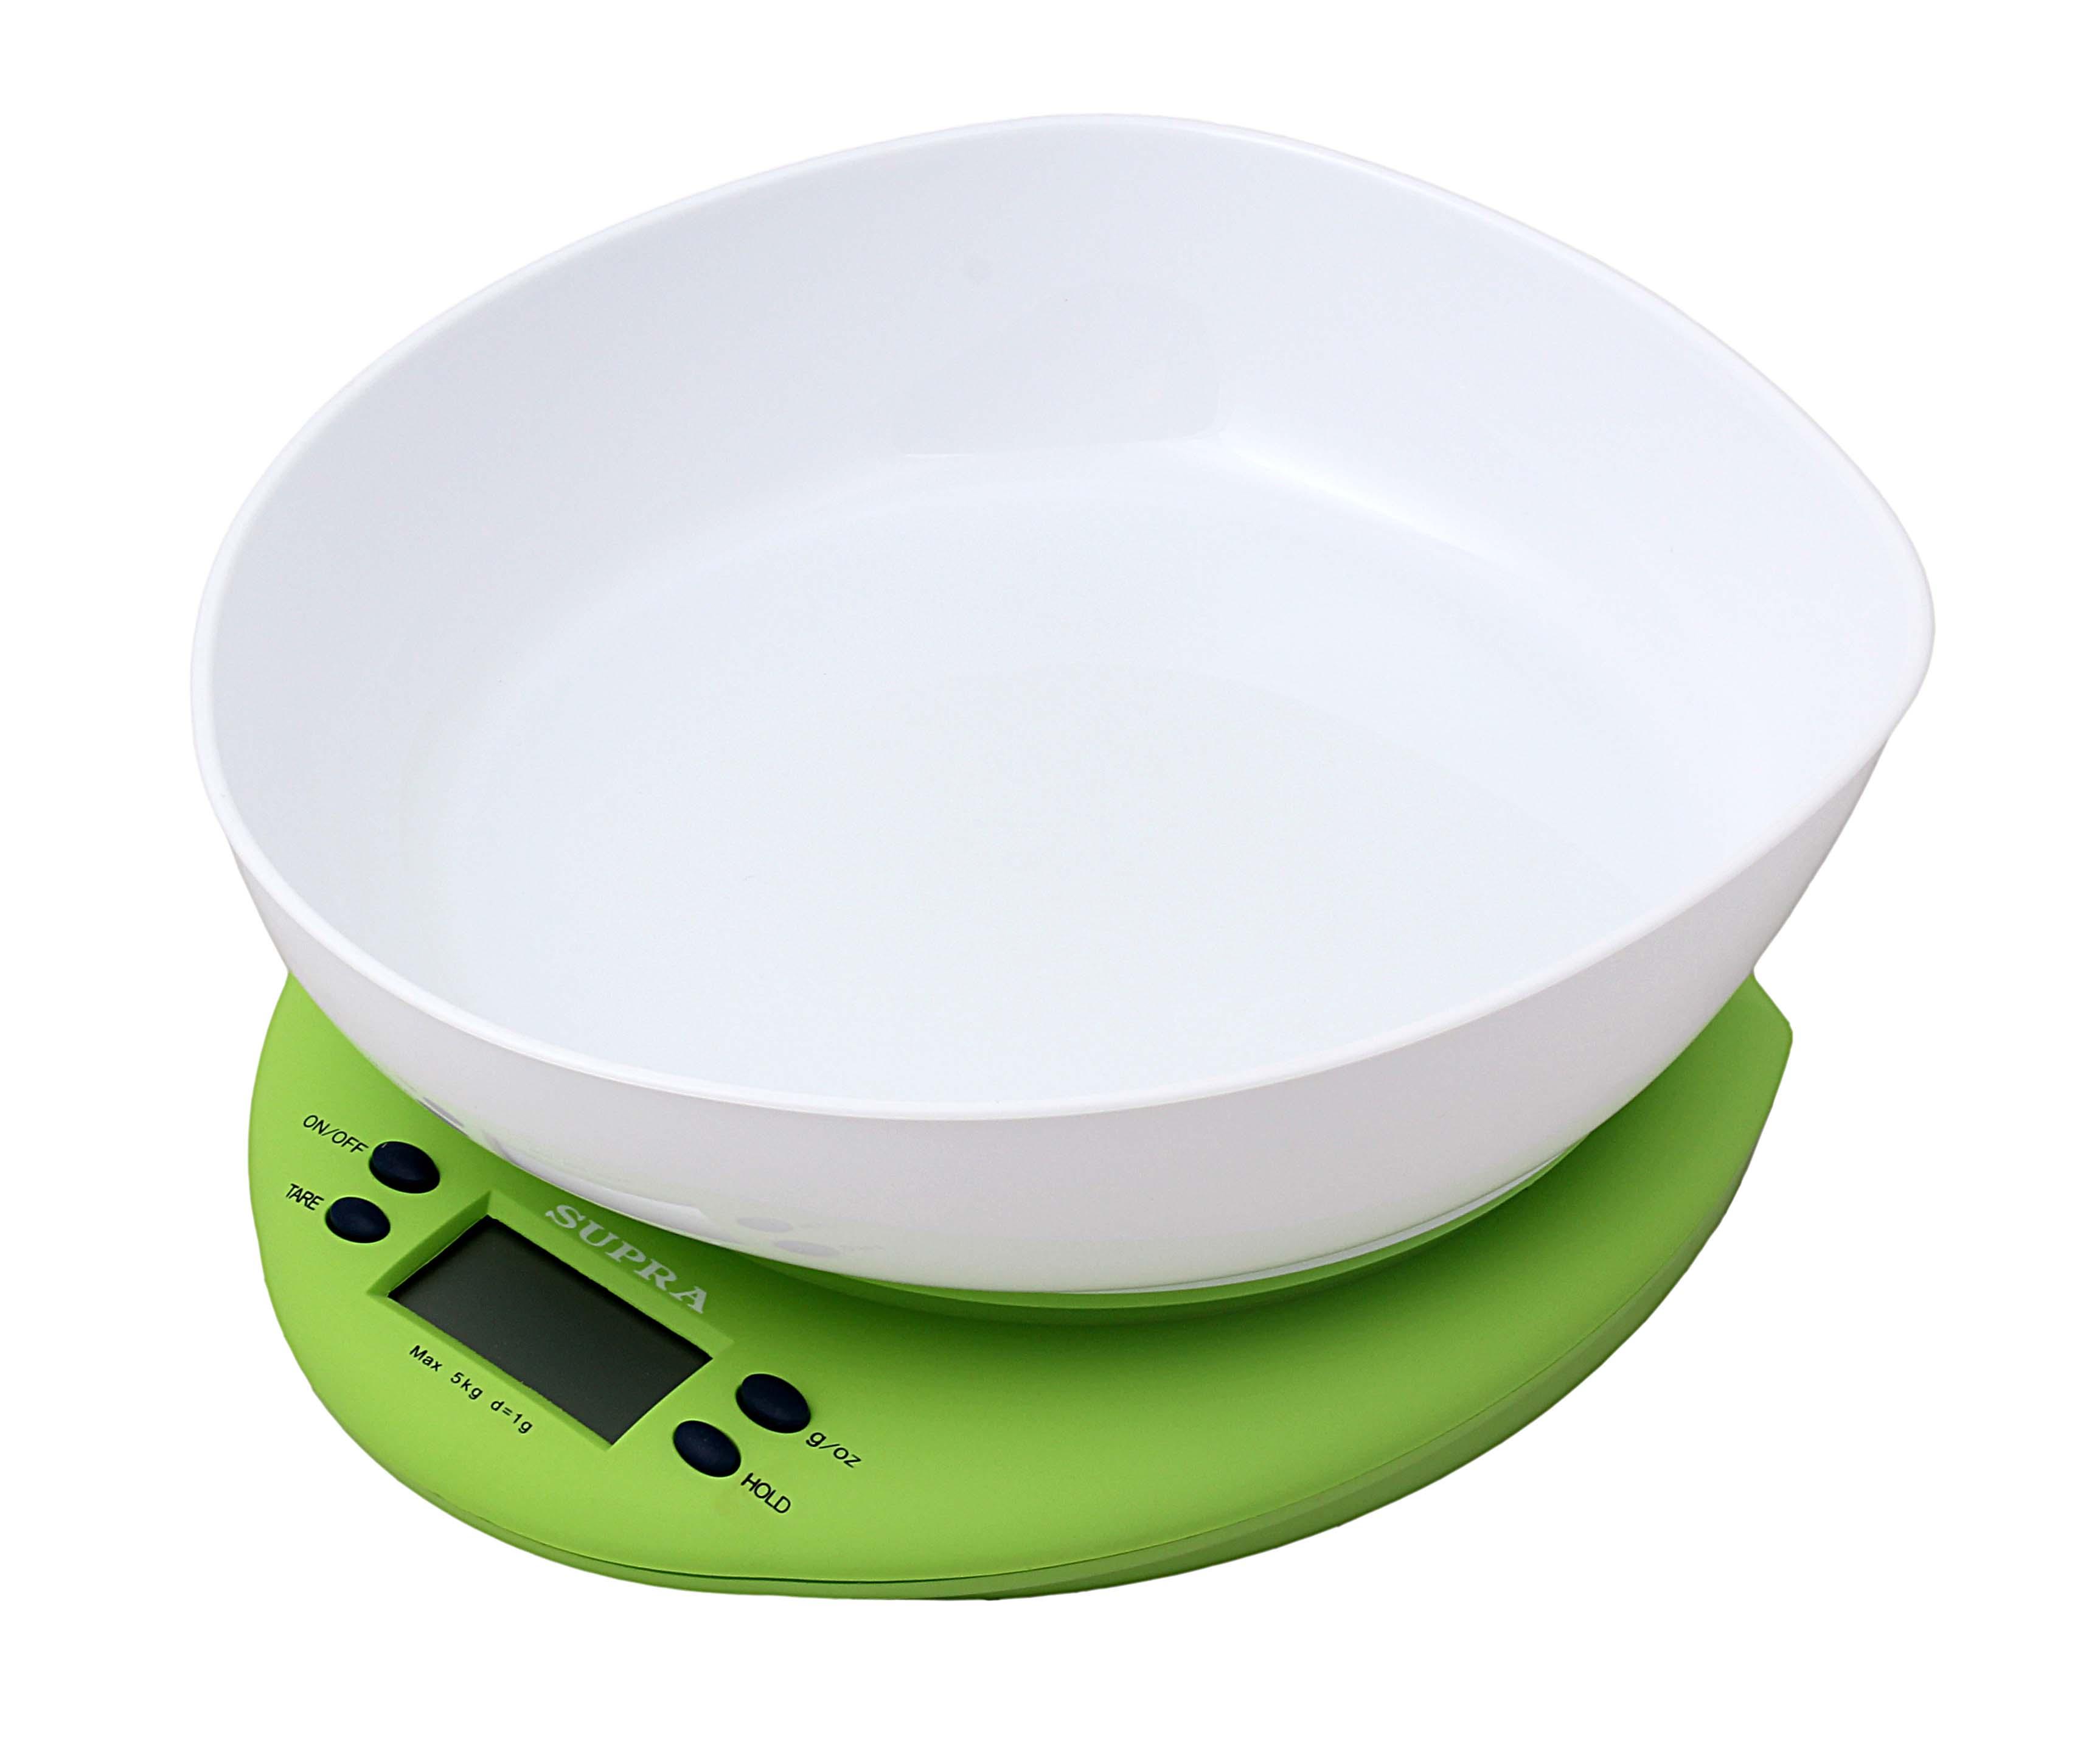 Весы кухонные Supra Real Brand Technics 490.000